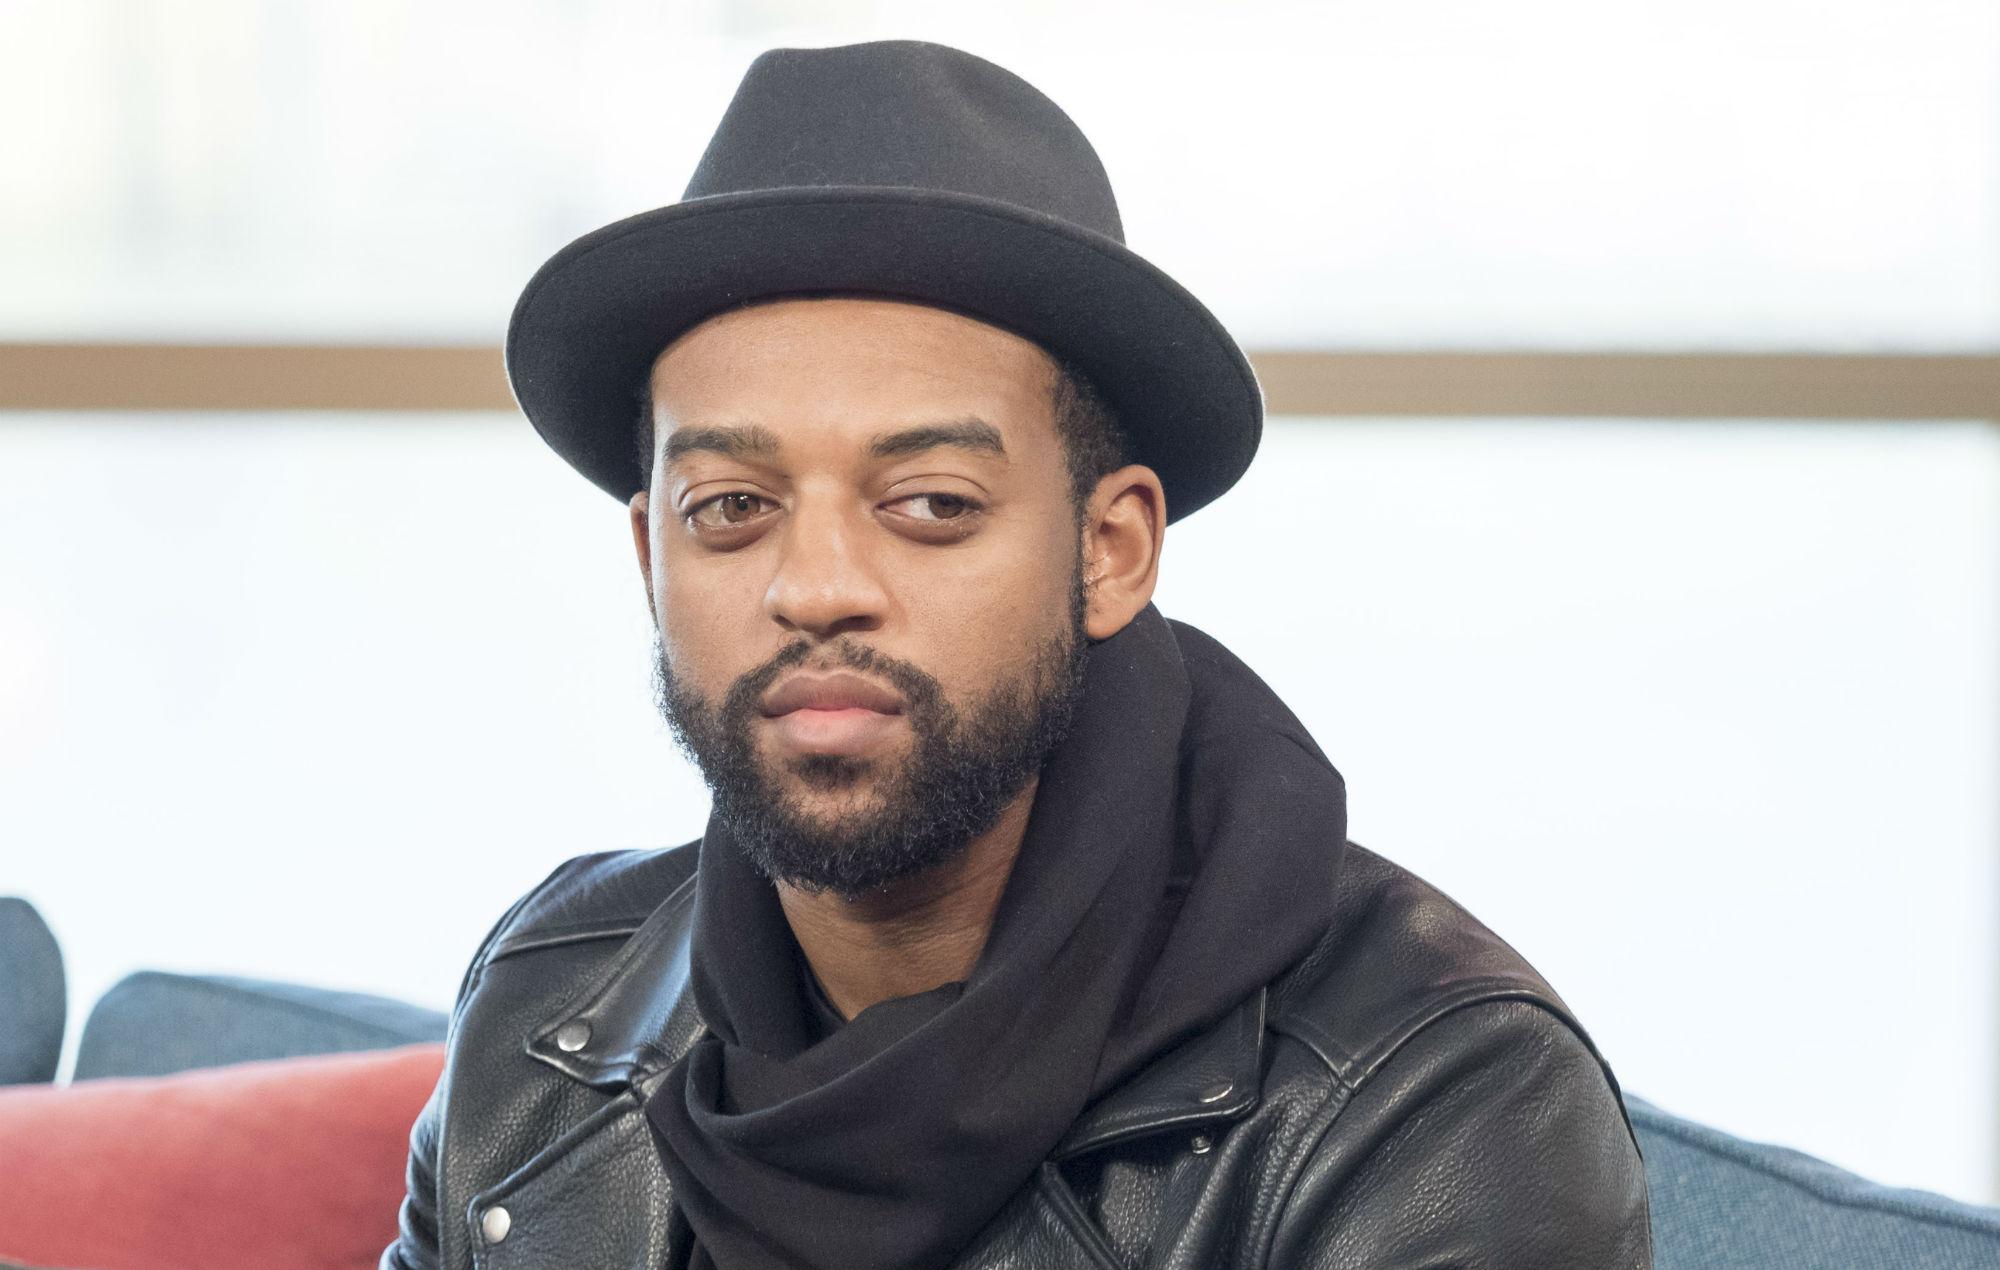 Jls Singer Oritse Williams To Face Rape Trial Next Year